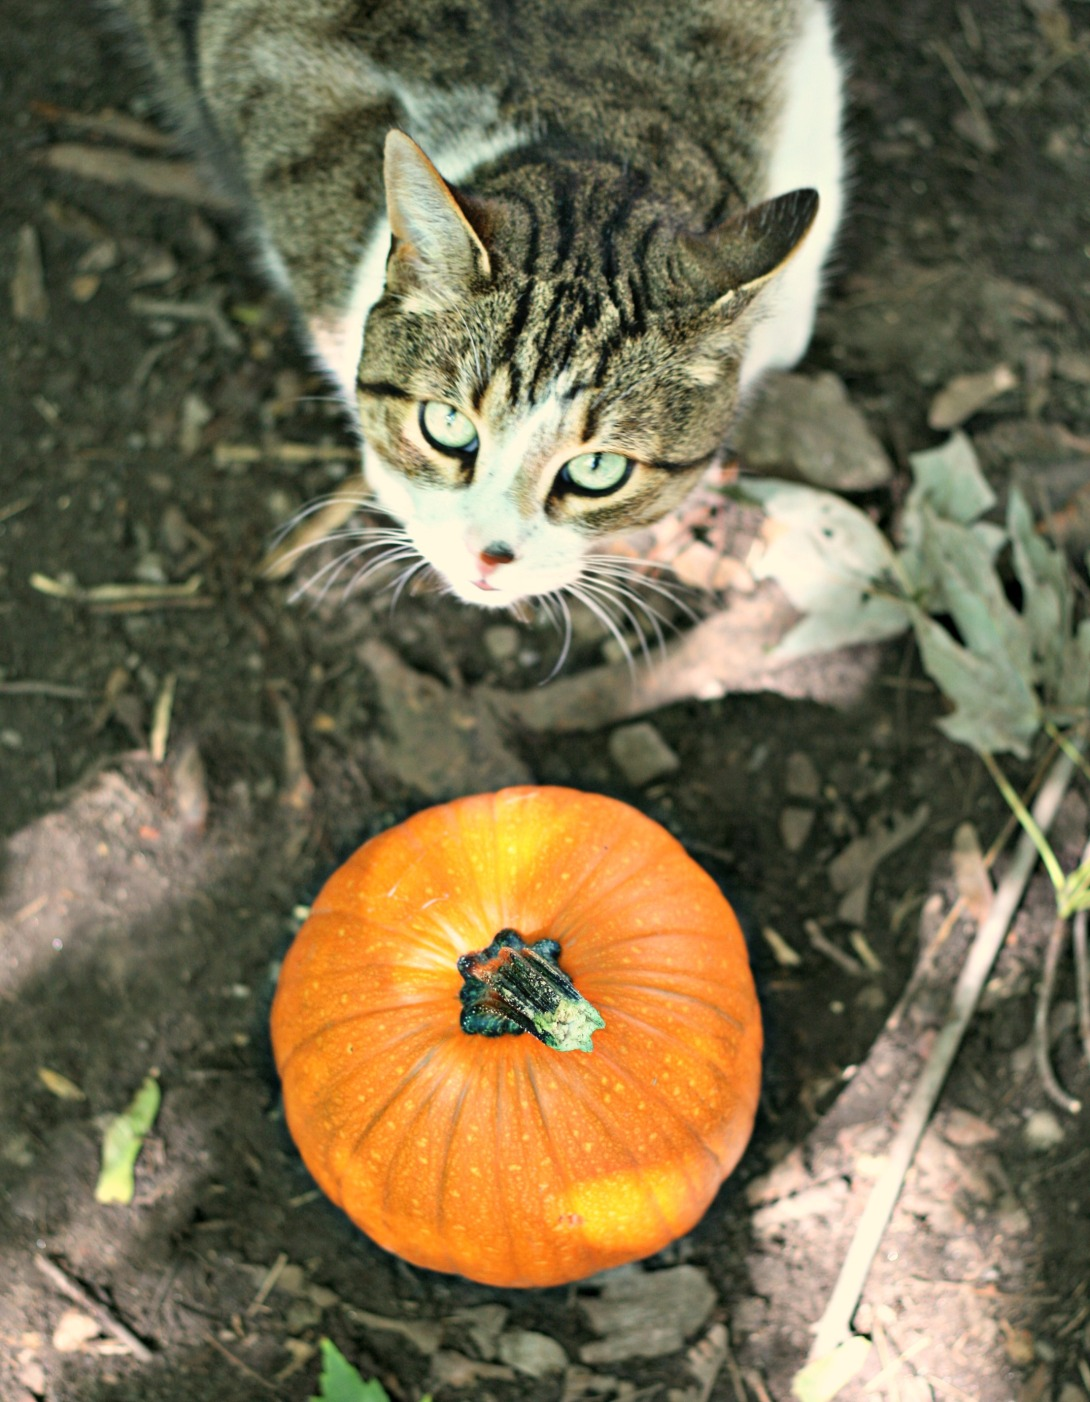 Benny and pumpkin